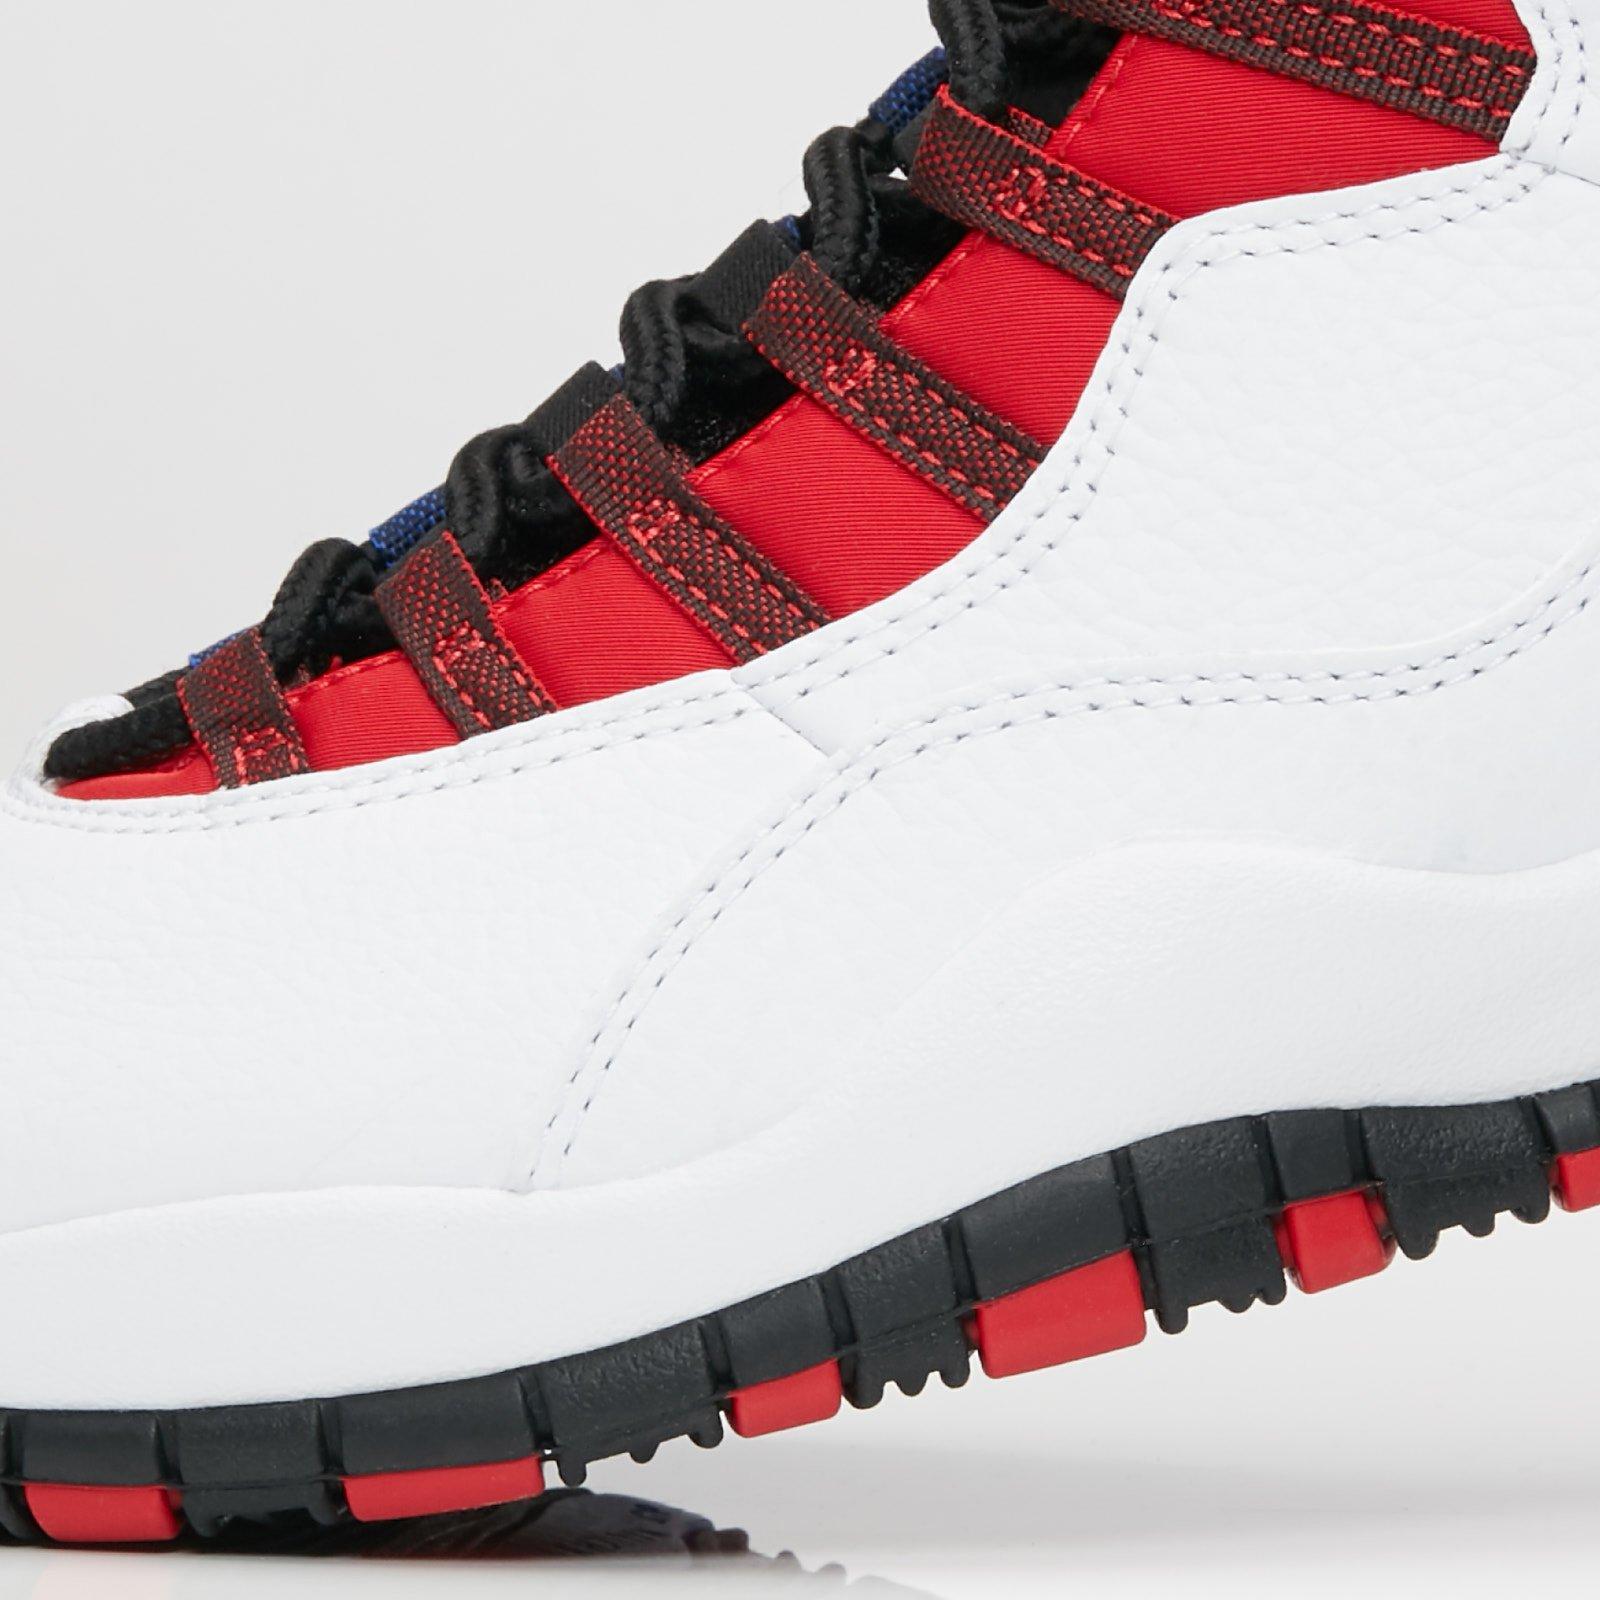 ab5a3d826c5d Jordan Brand Air Jordan 10 Retro - 310805-160 - Sneakersnstuff ...